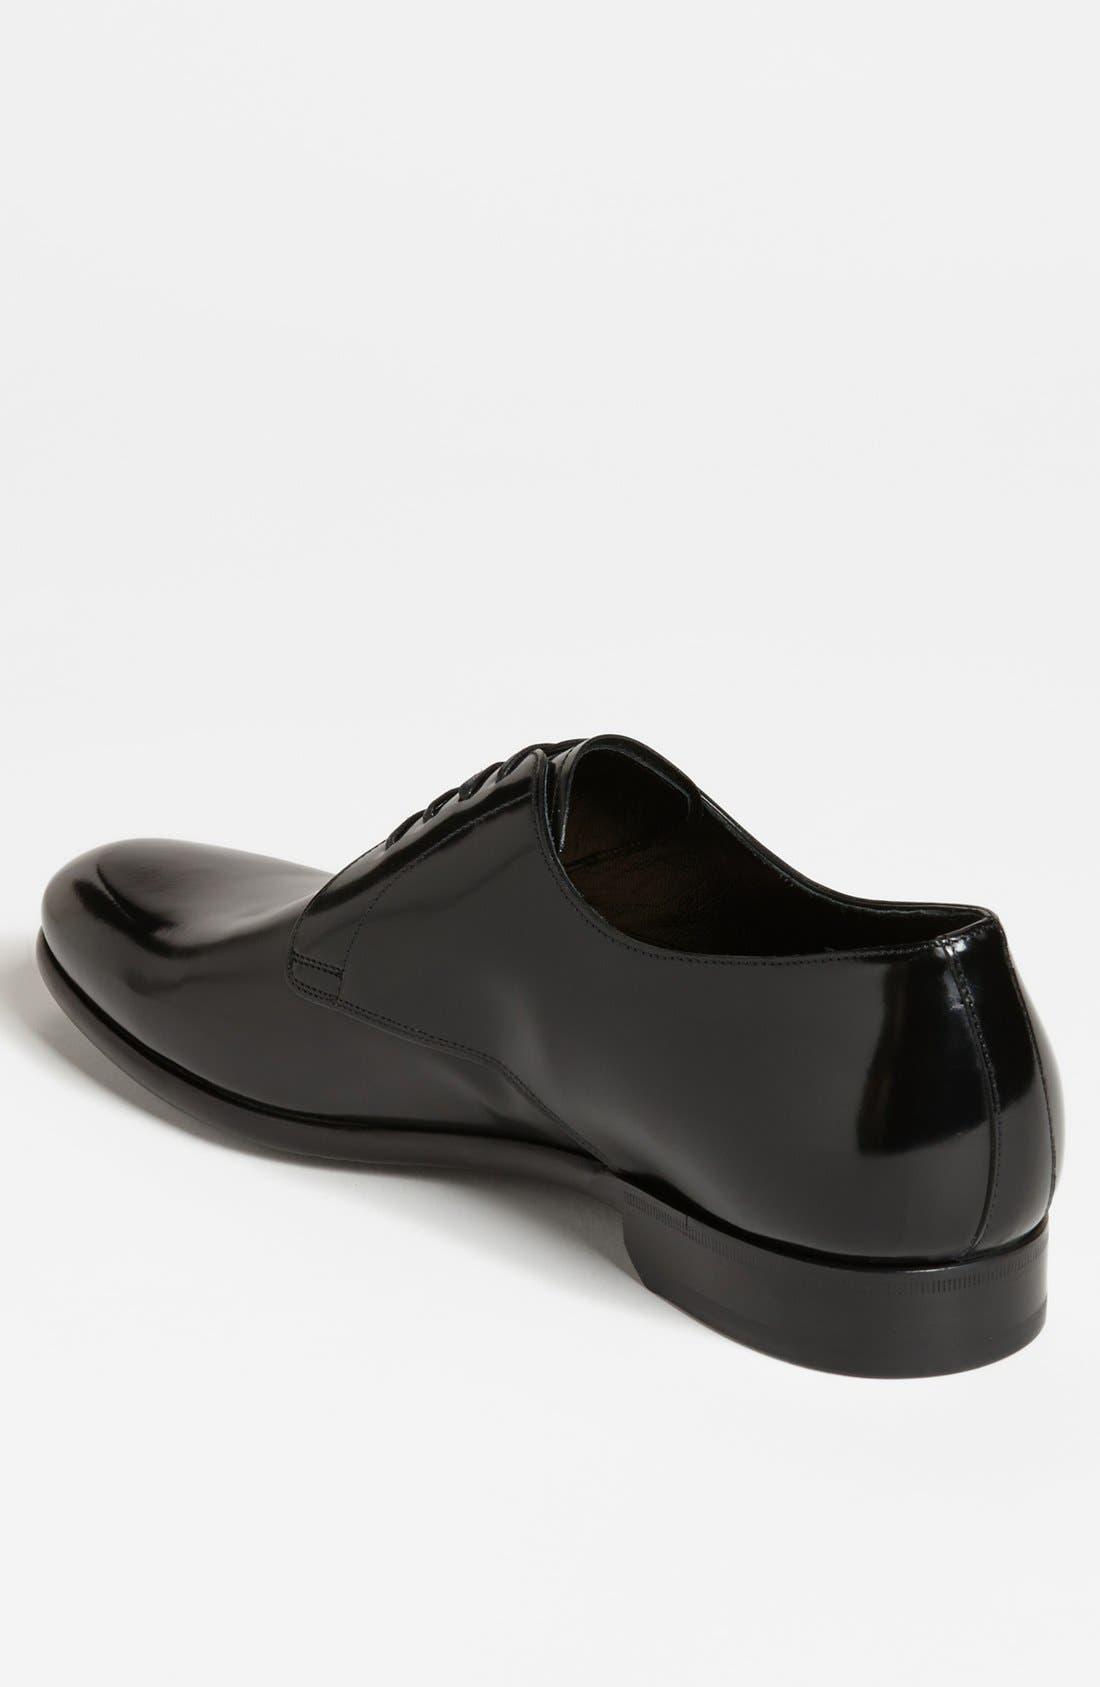 Alternate Image 2  - Dolce&Gabbana 'Napoli' Plain Toe Derby